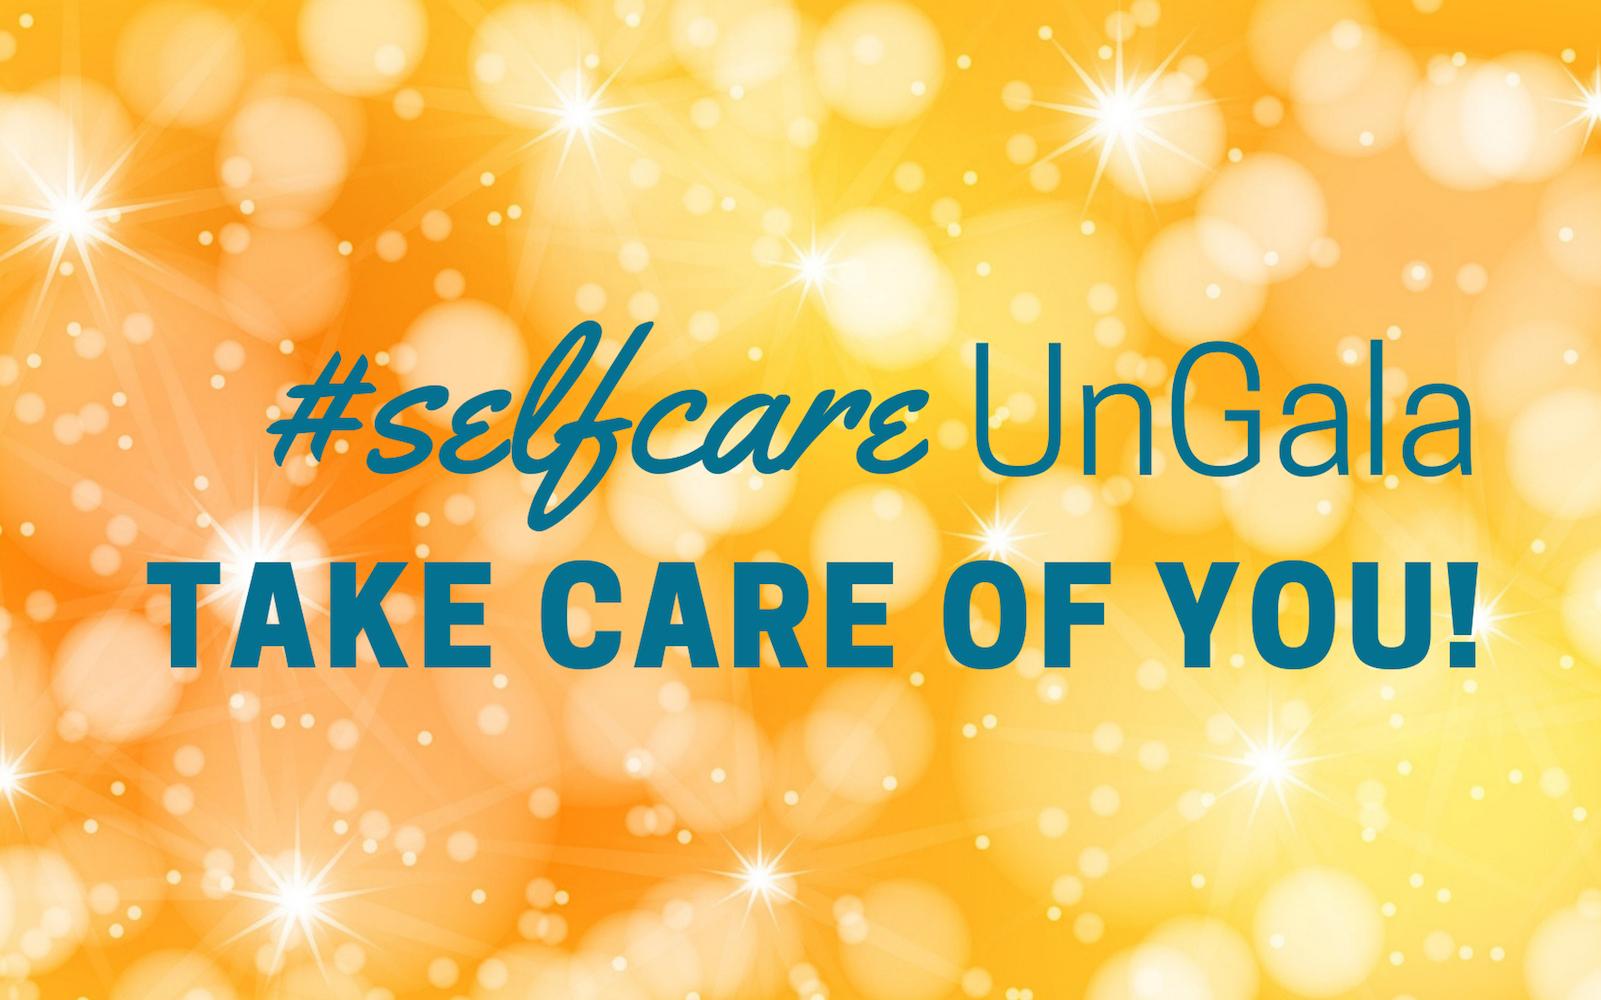 Take Care of You! image